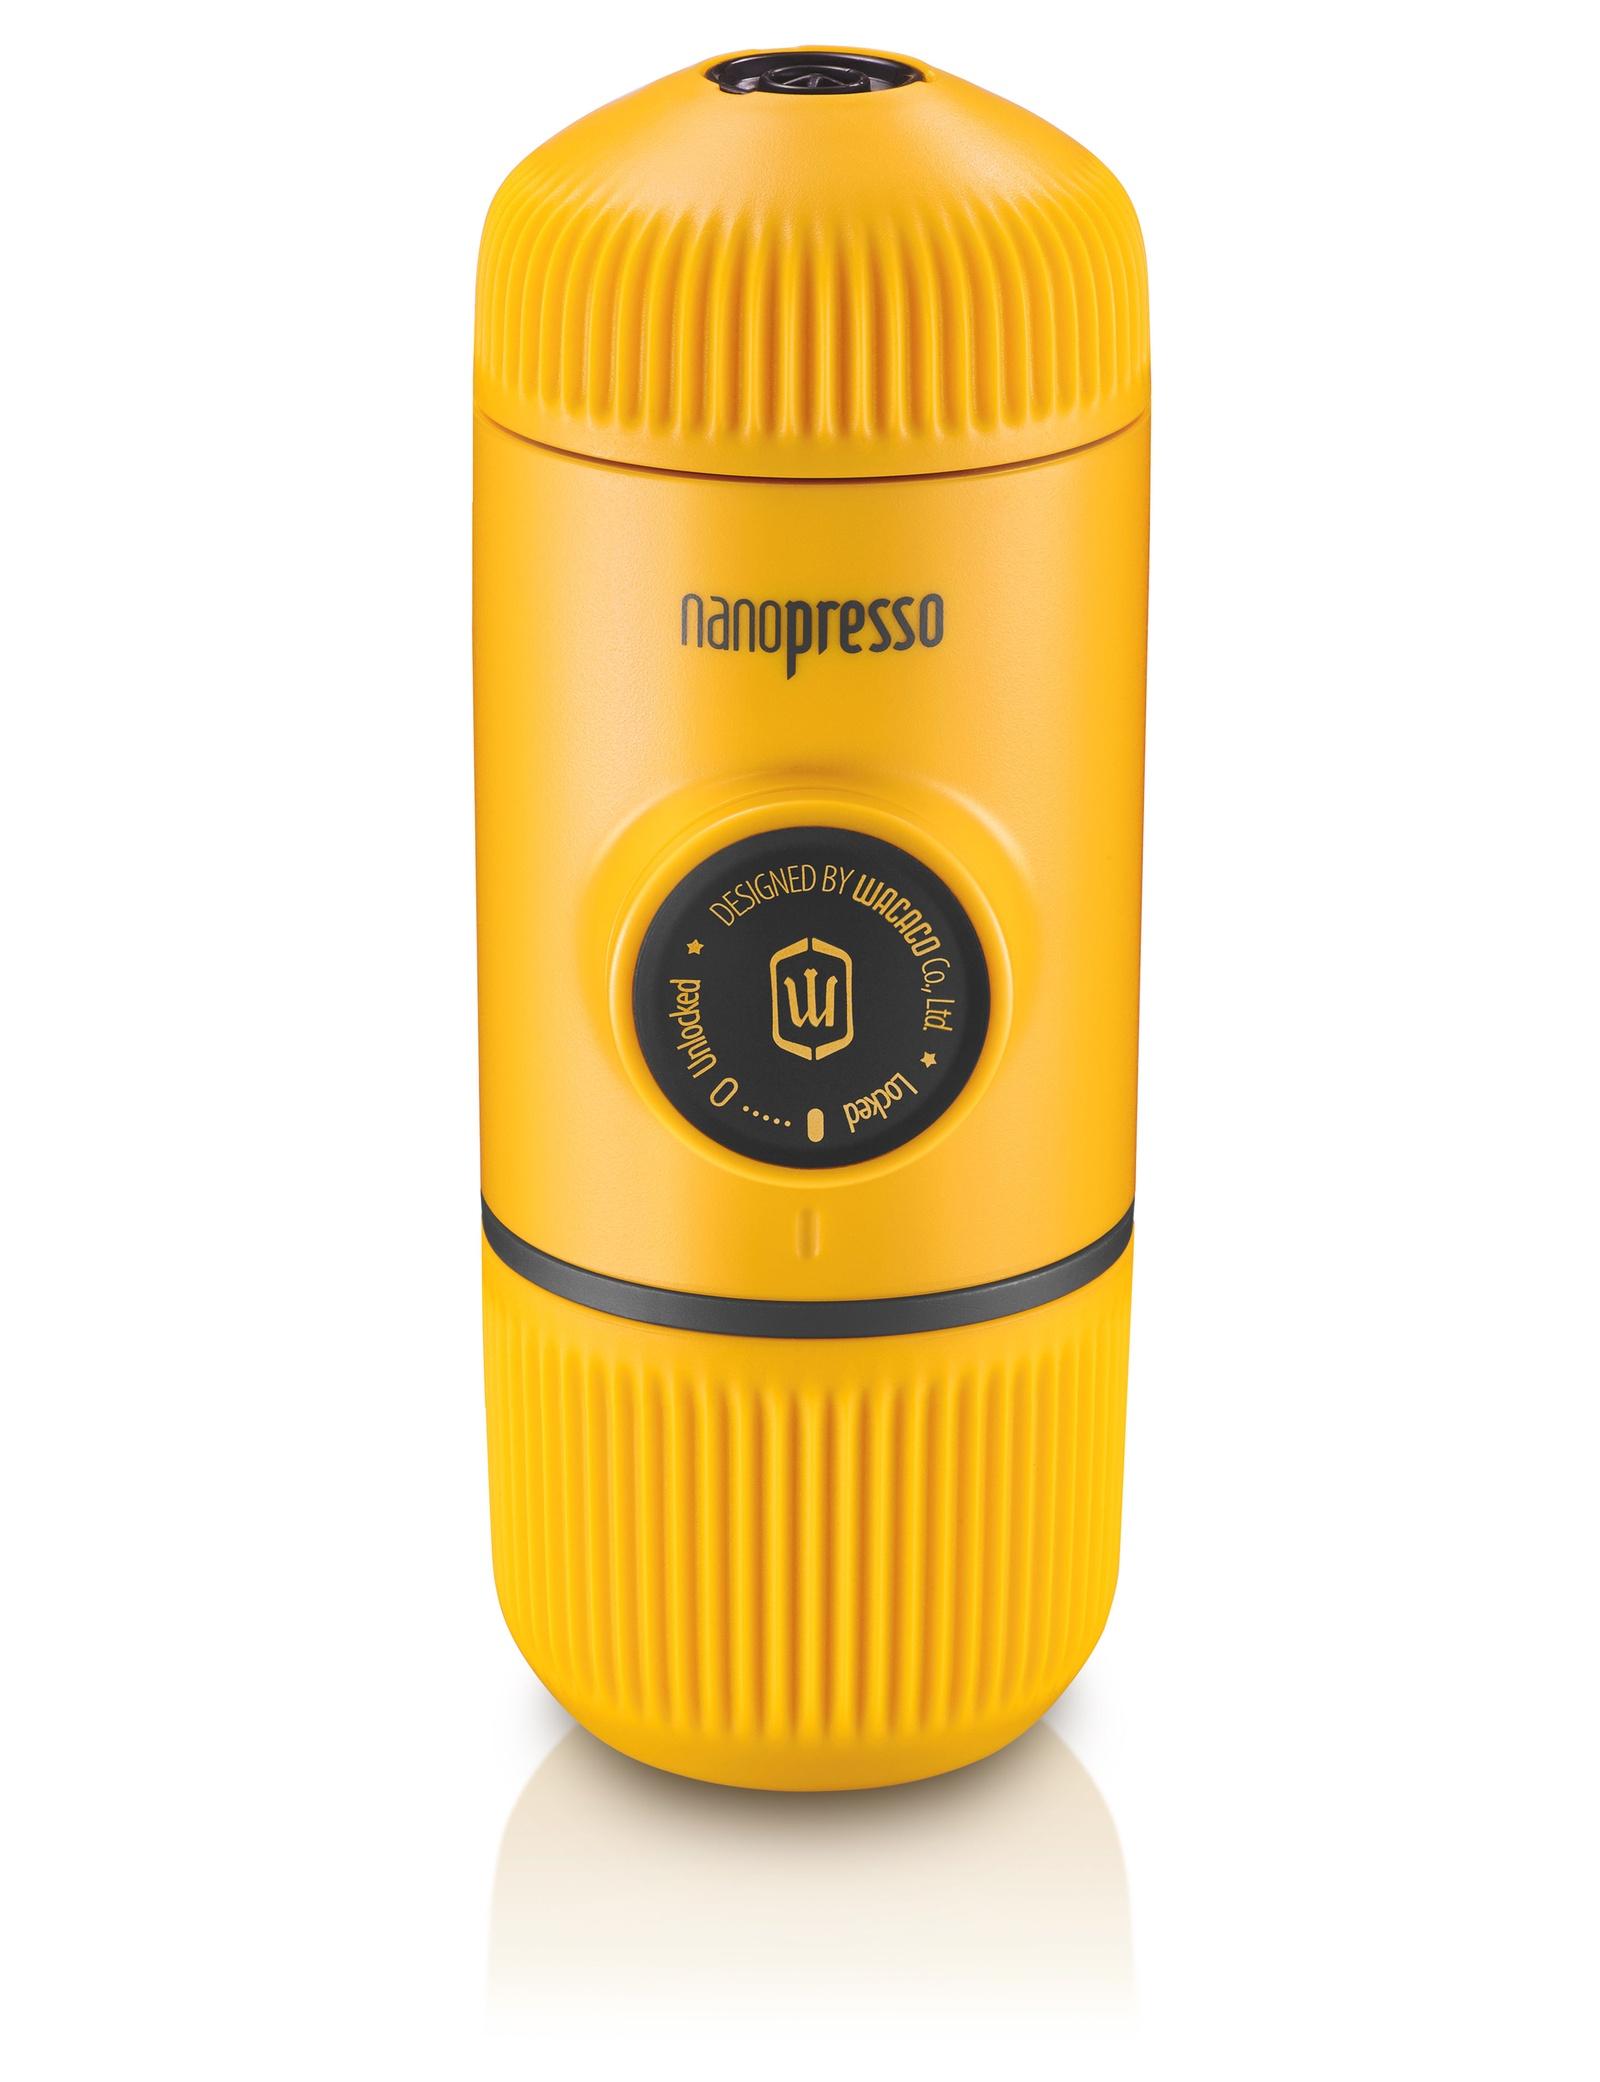 Кофемашина Wacaco Ручная мини-кофемашина (NANOPRESSO-YELLOWPATROL), молотый кофе, желтый